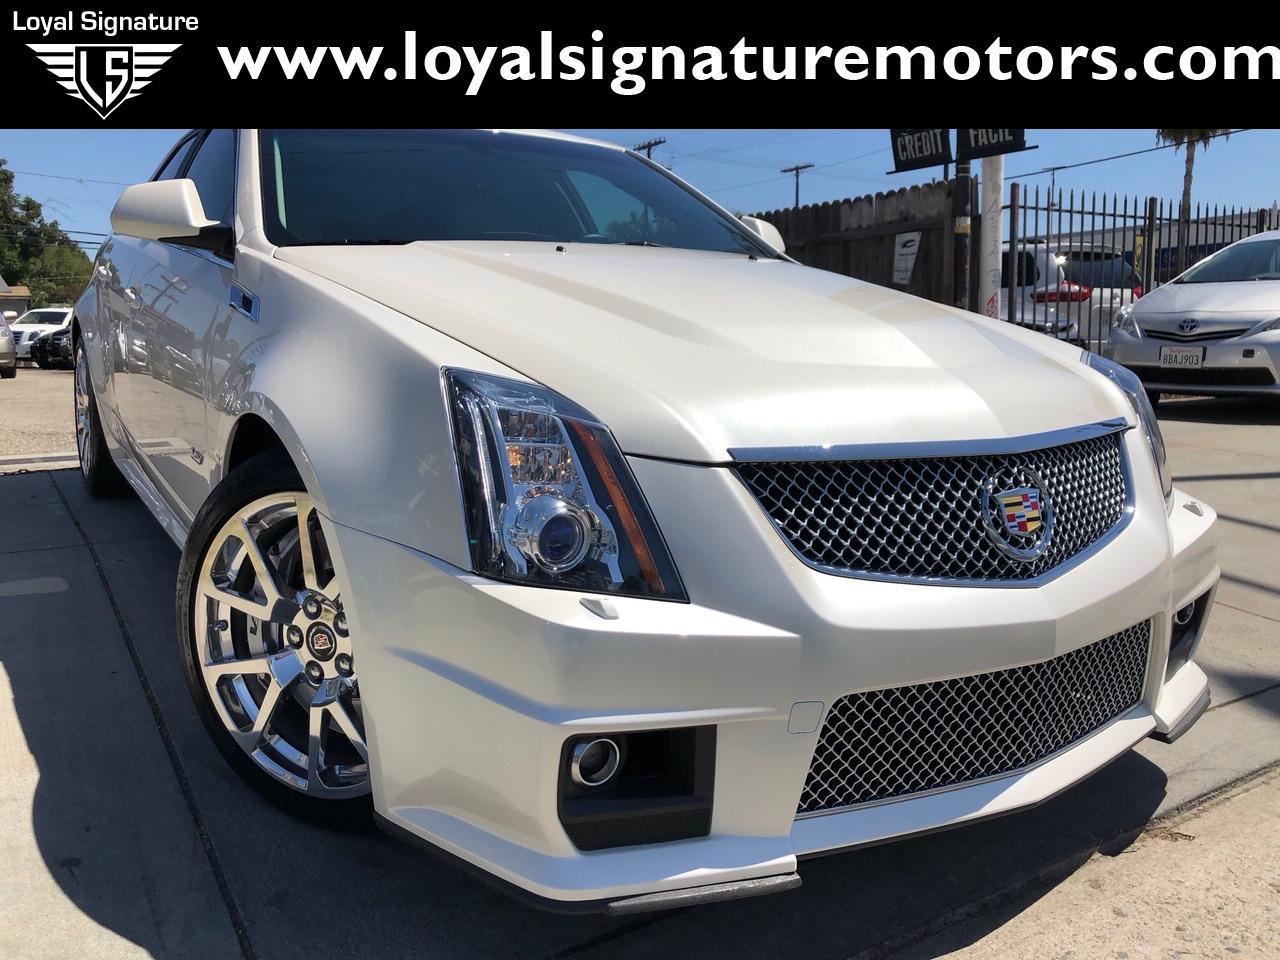 Used 2012 Cadillac CTS-V  | Van Nuys, CA